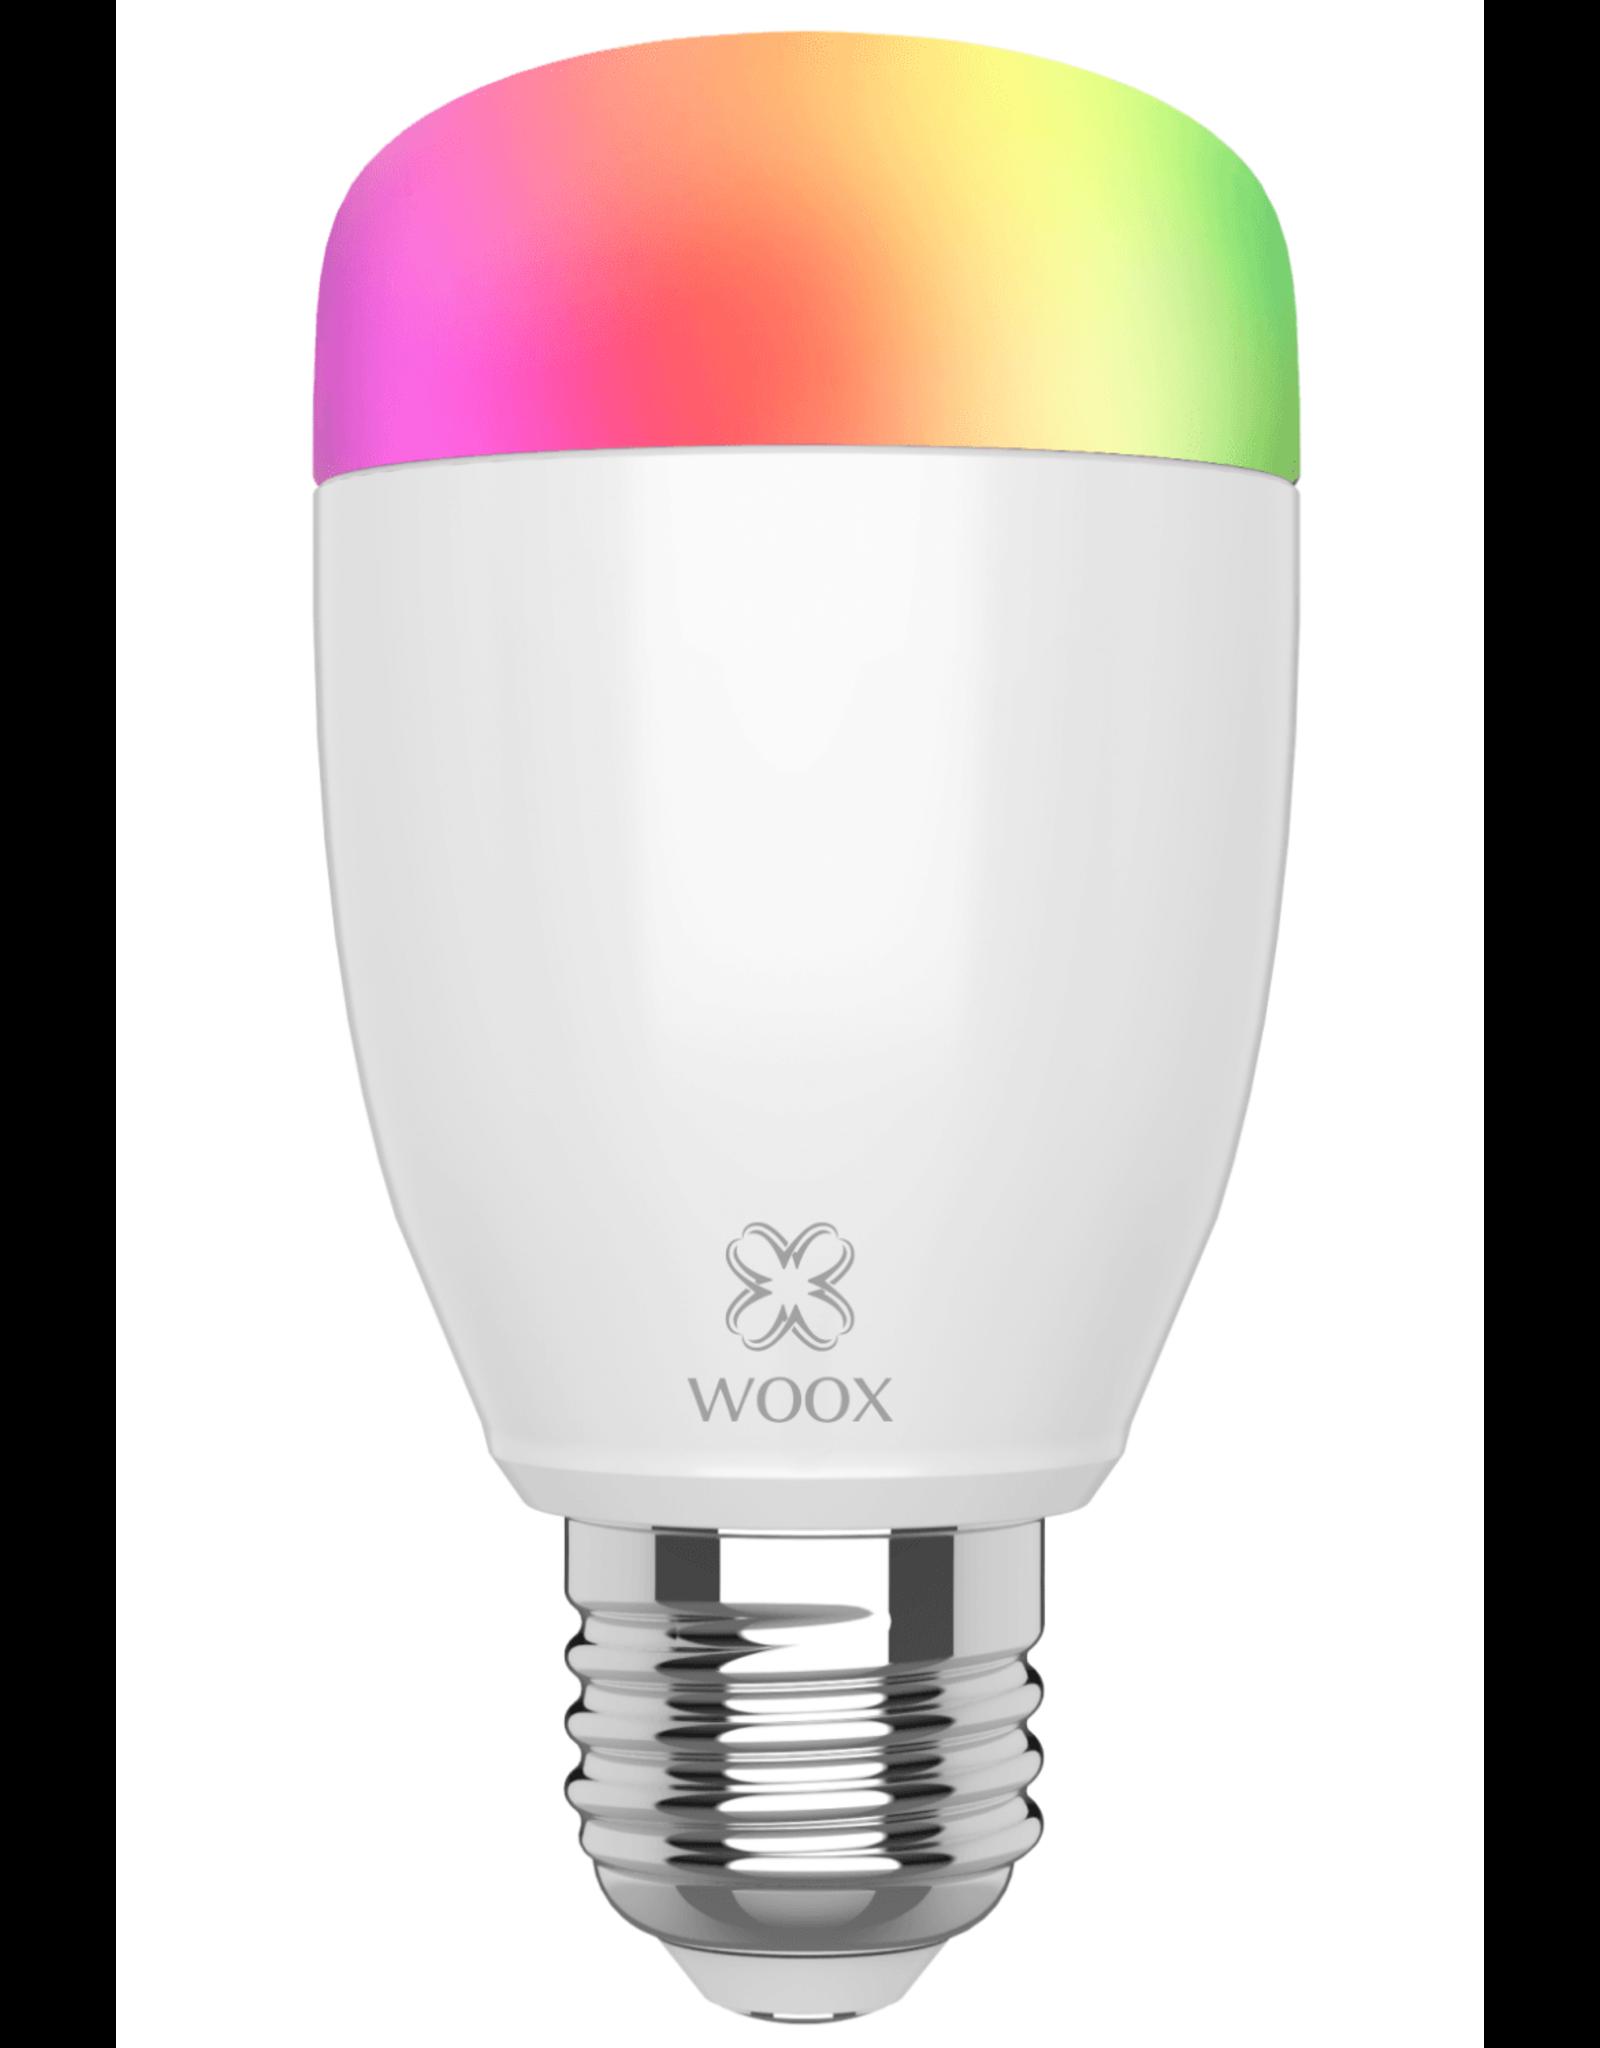 Woox Home Smart Bulb E27 RGB+WW High Performance | R5085